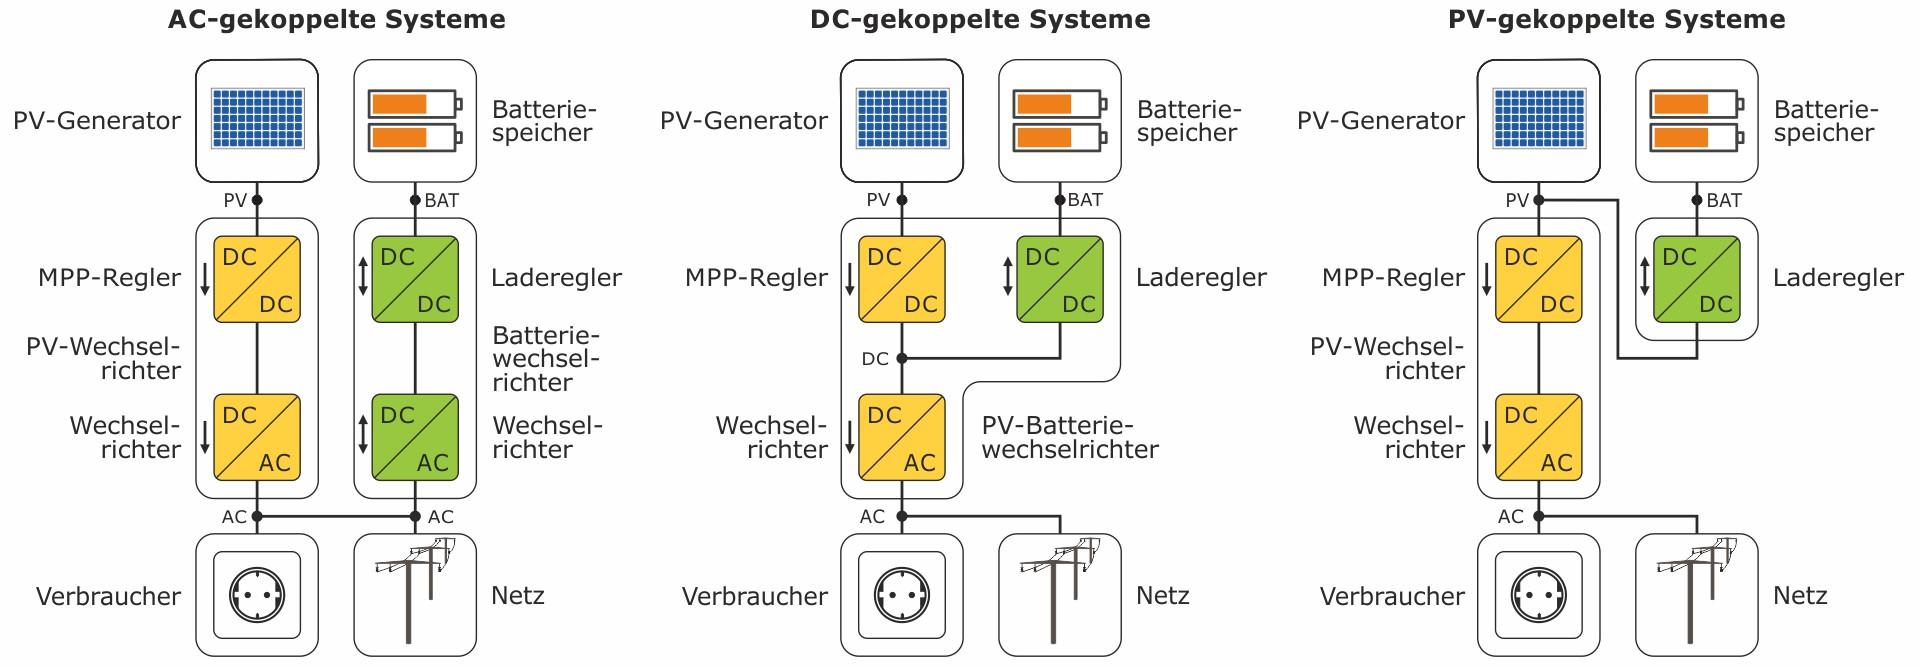 Systemtopologien